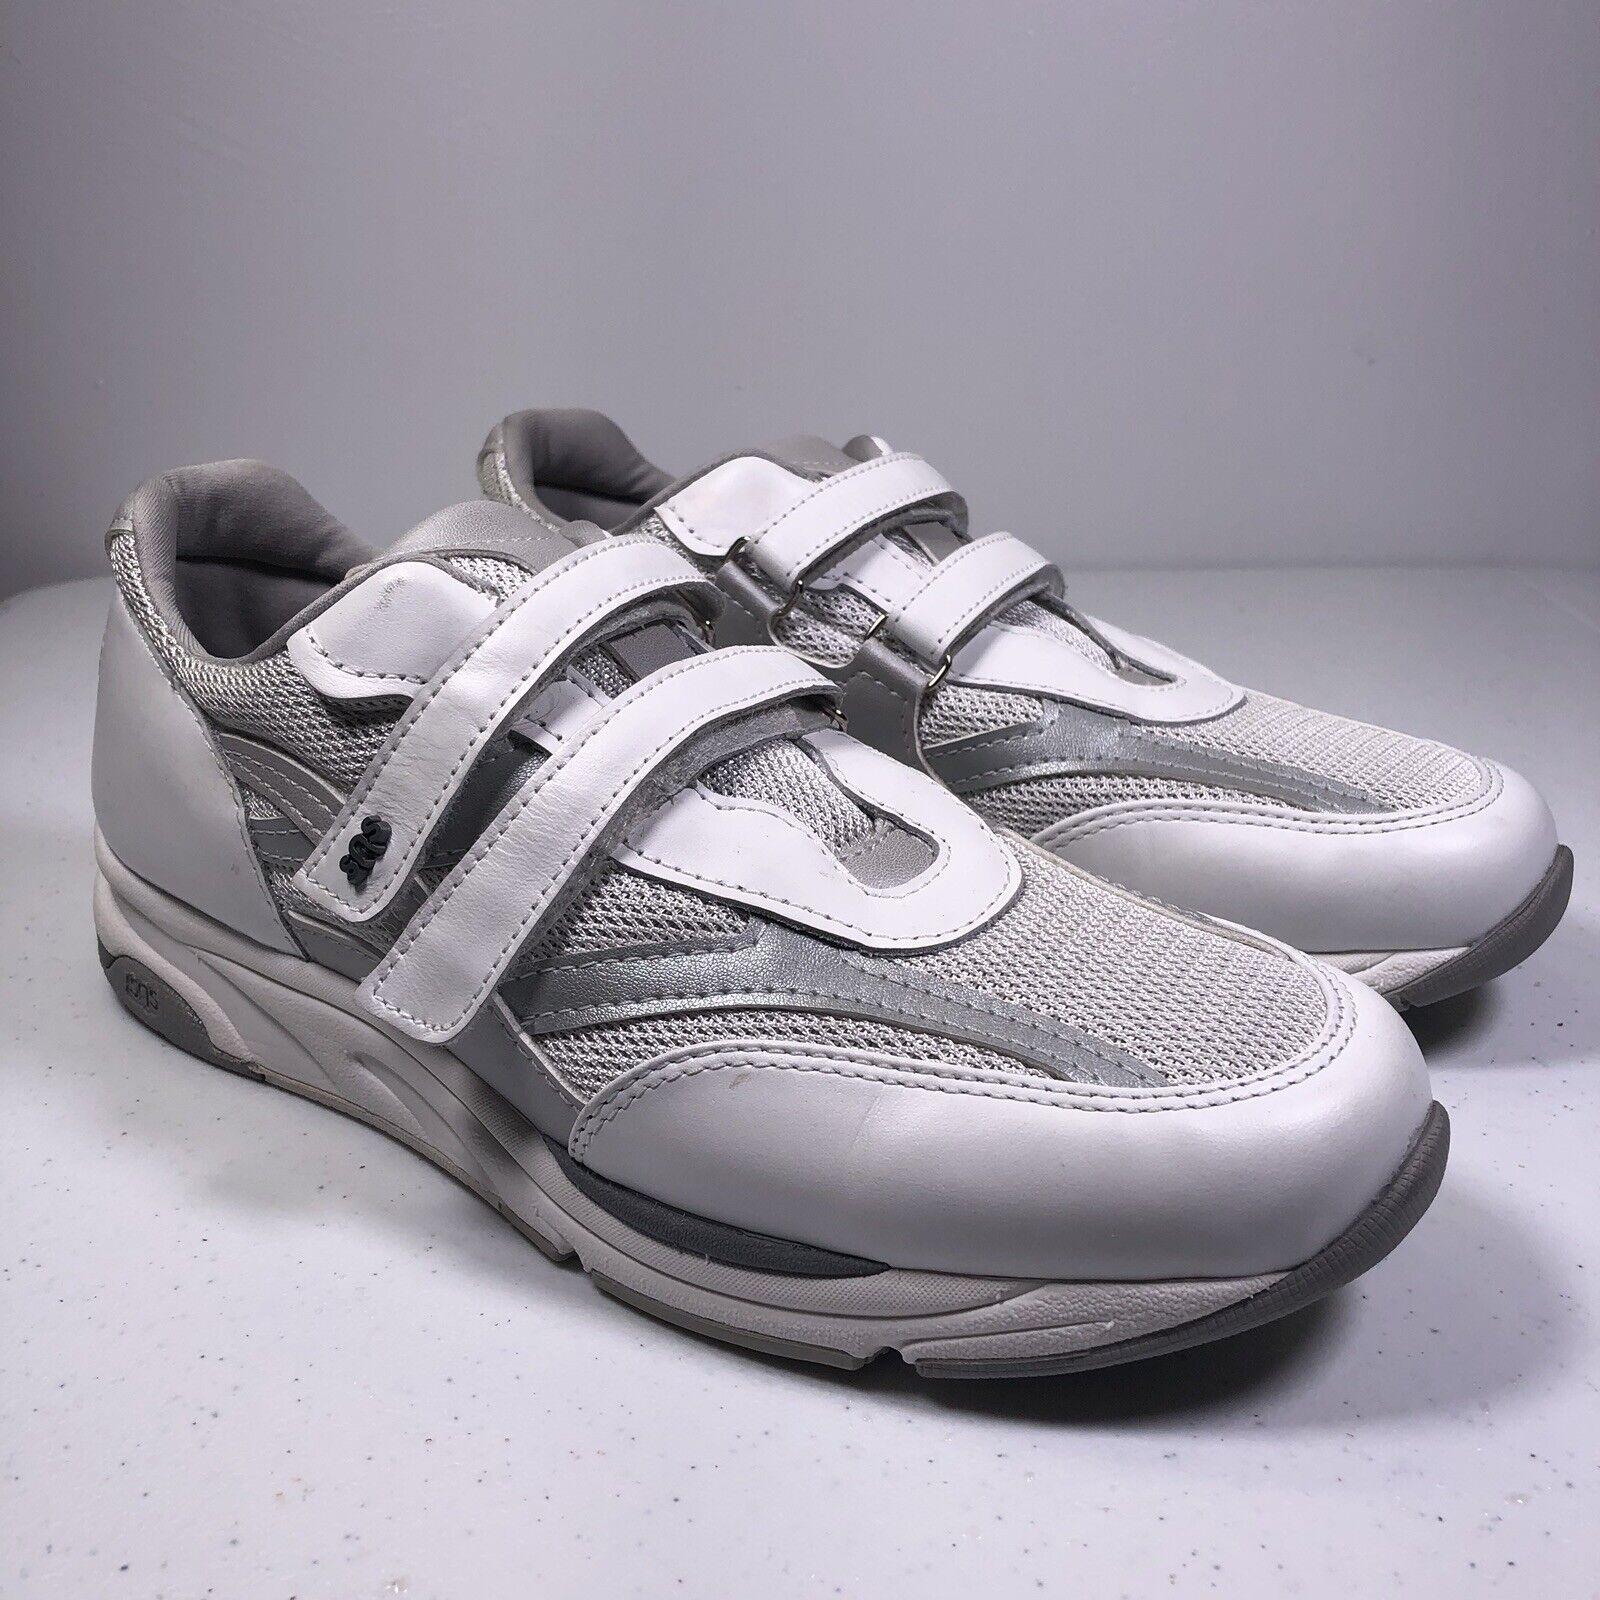 SAS Women's White Leather Tripad Comfort shoes Velcro Closure Size 10N